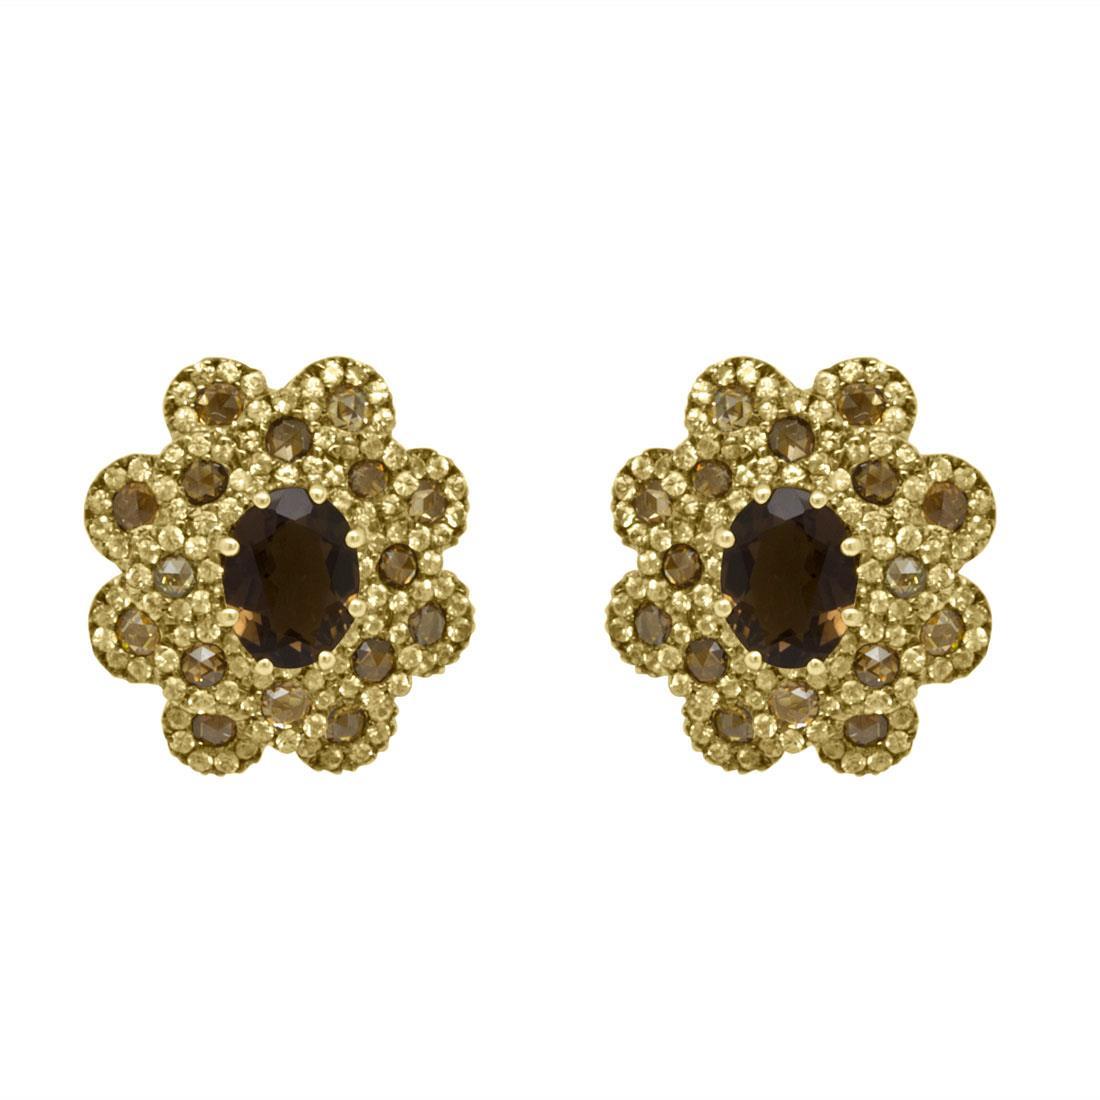 Orecchini Damiani oro giallo con diamanti ct 1,16 - DAMIANI